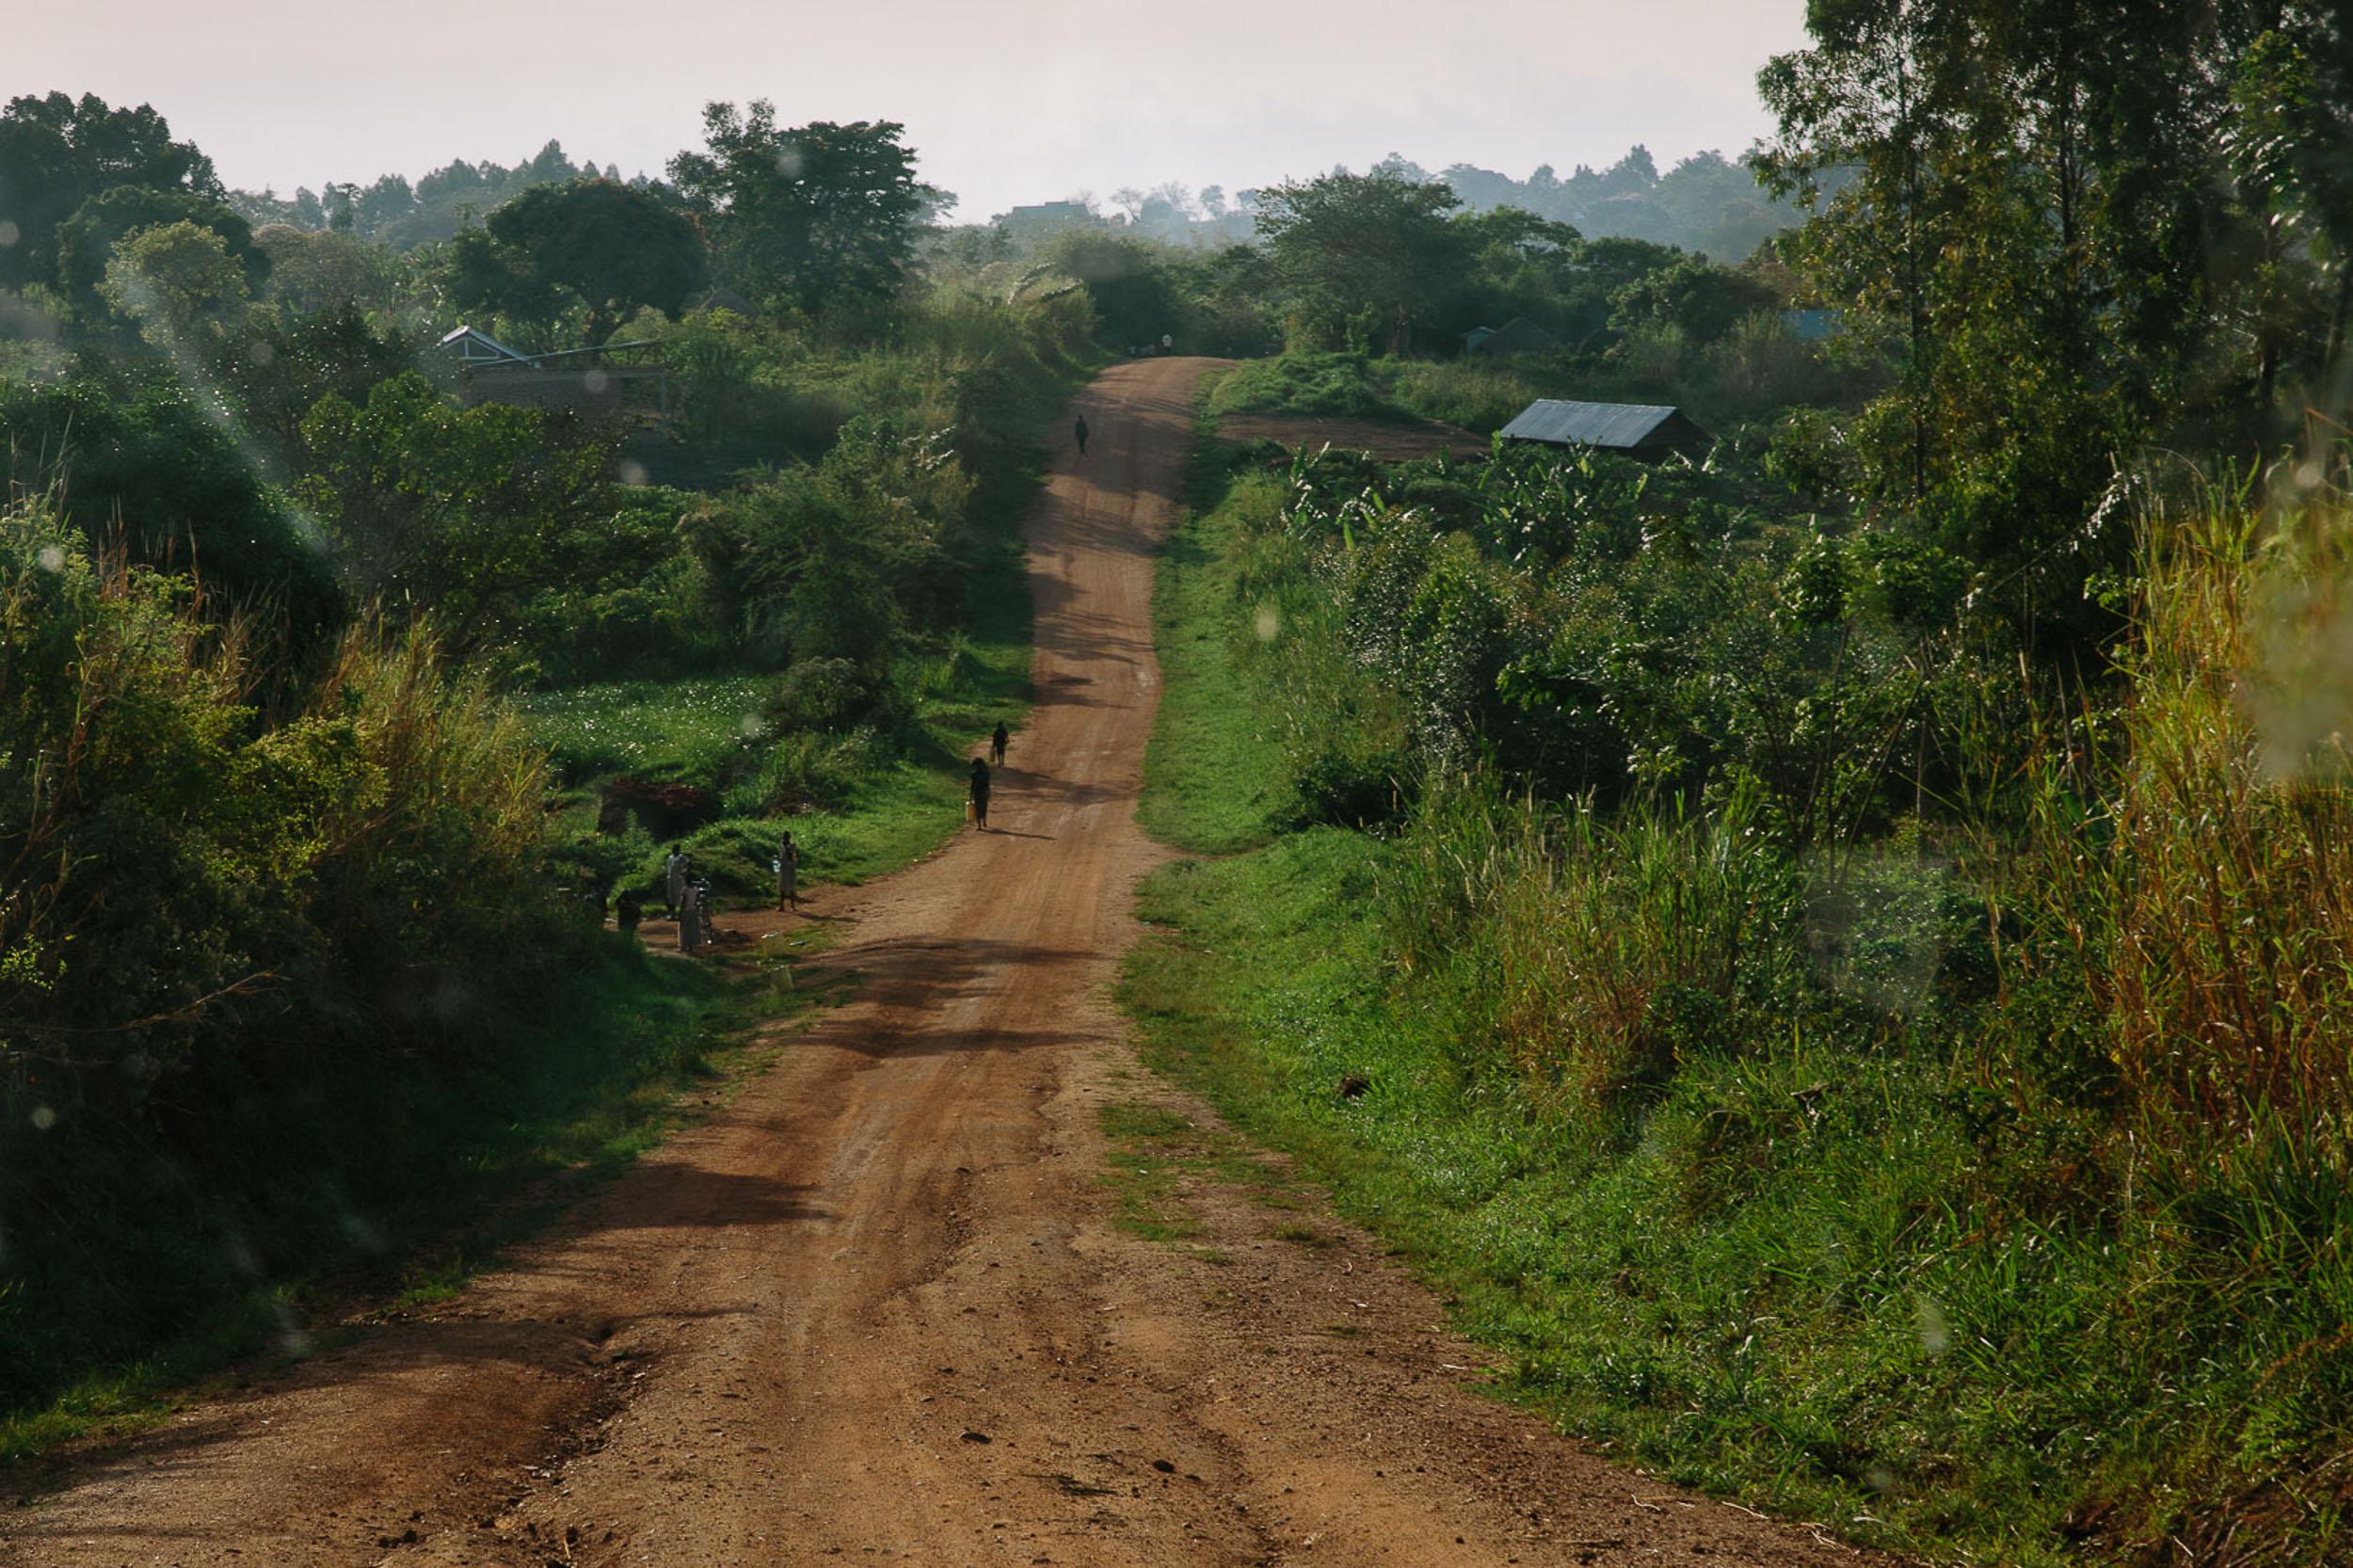 uganda-ajws-christine-han-photography-109.jpg